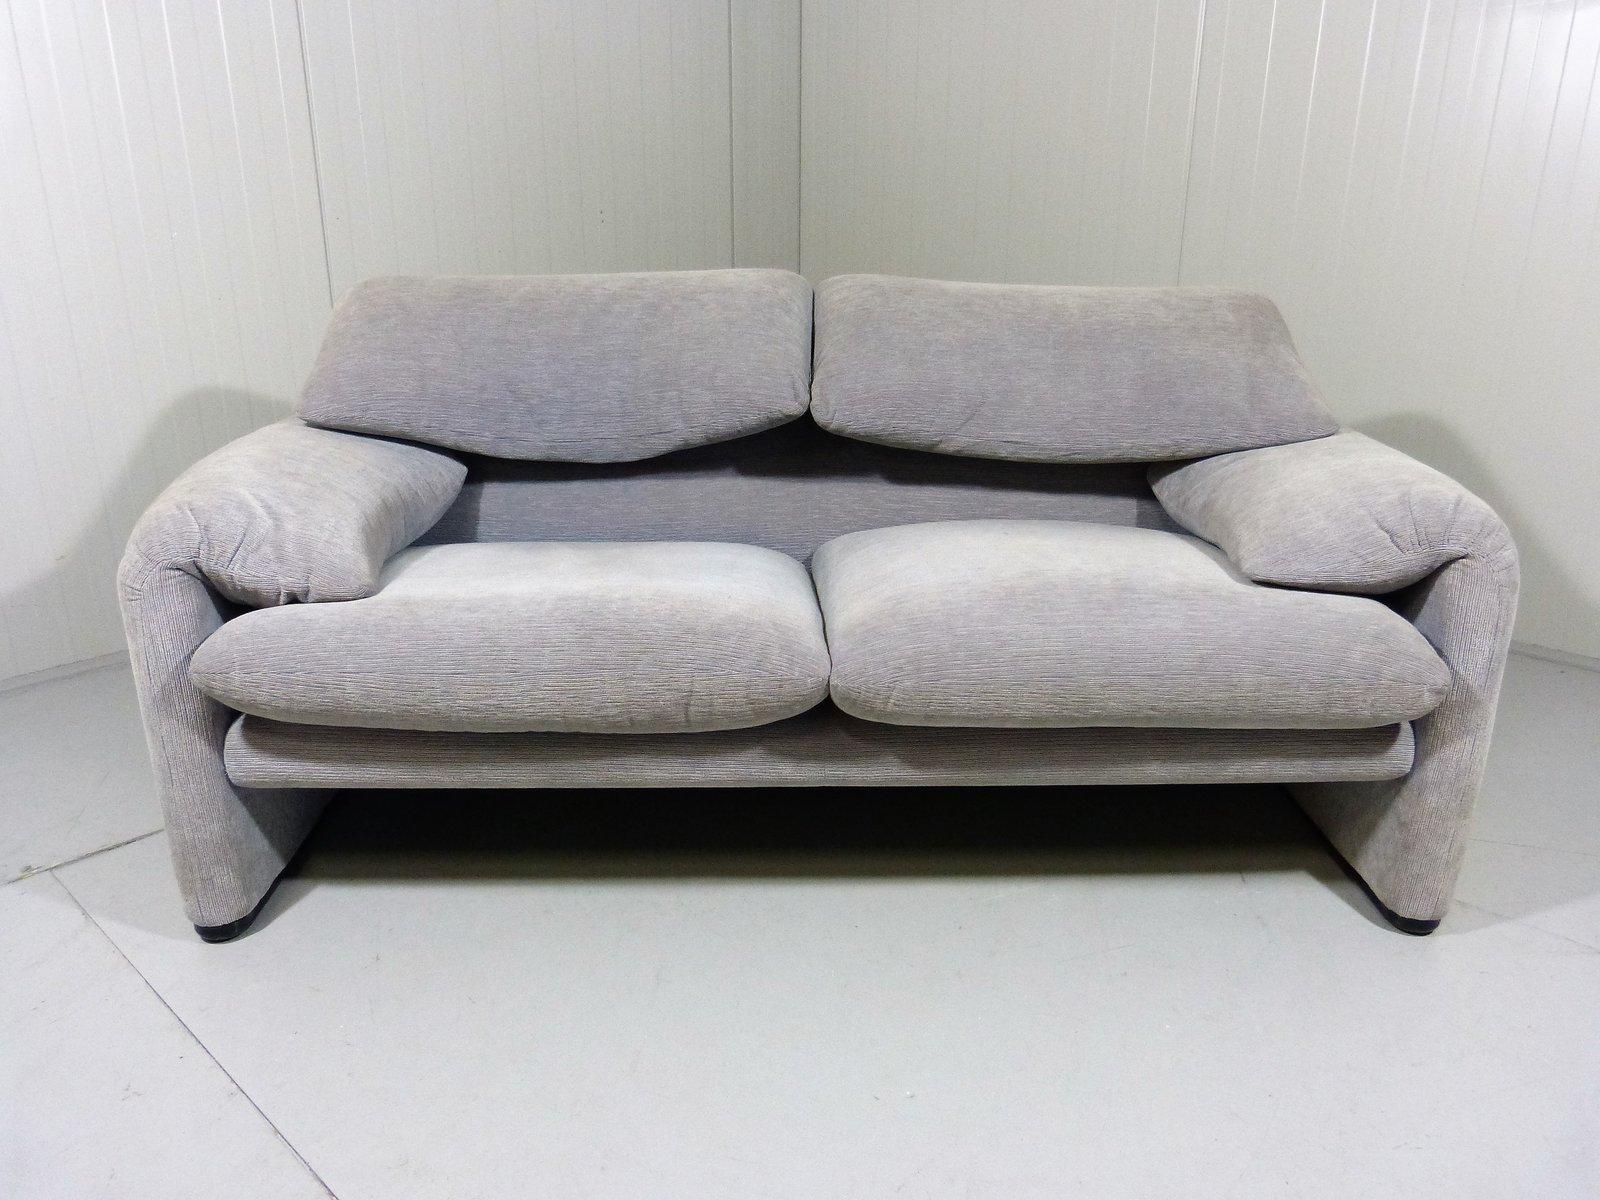 canap 2 places vintage maralunga par vico magistretti. Black Bedroom Furniture Sets. Home Design Ideas